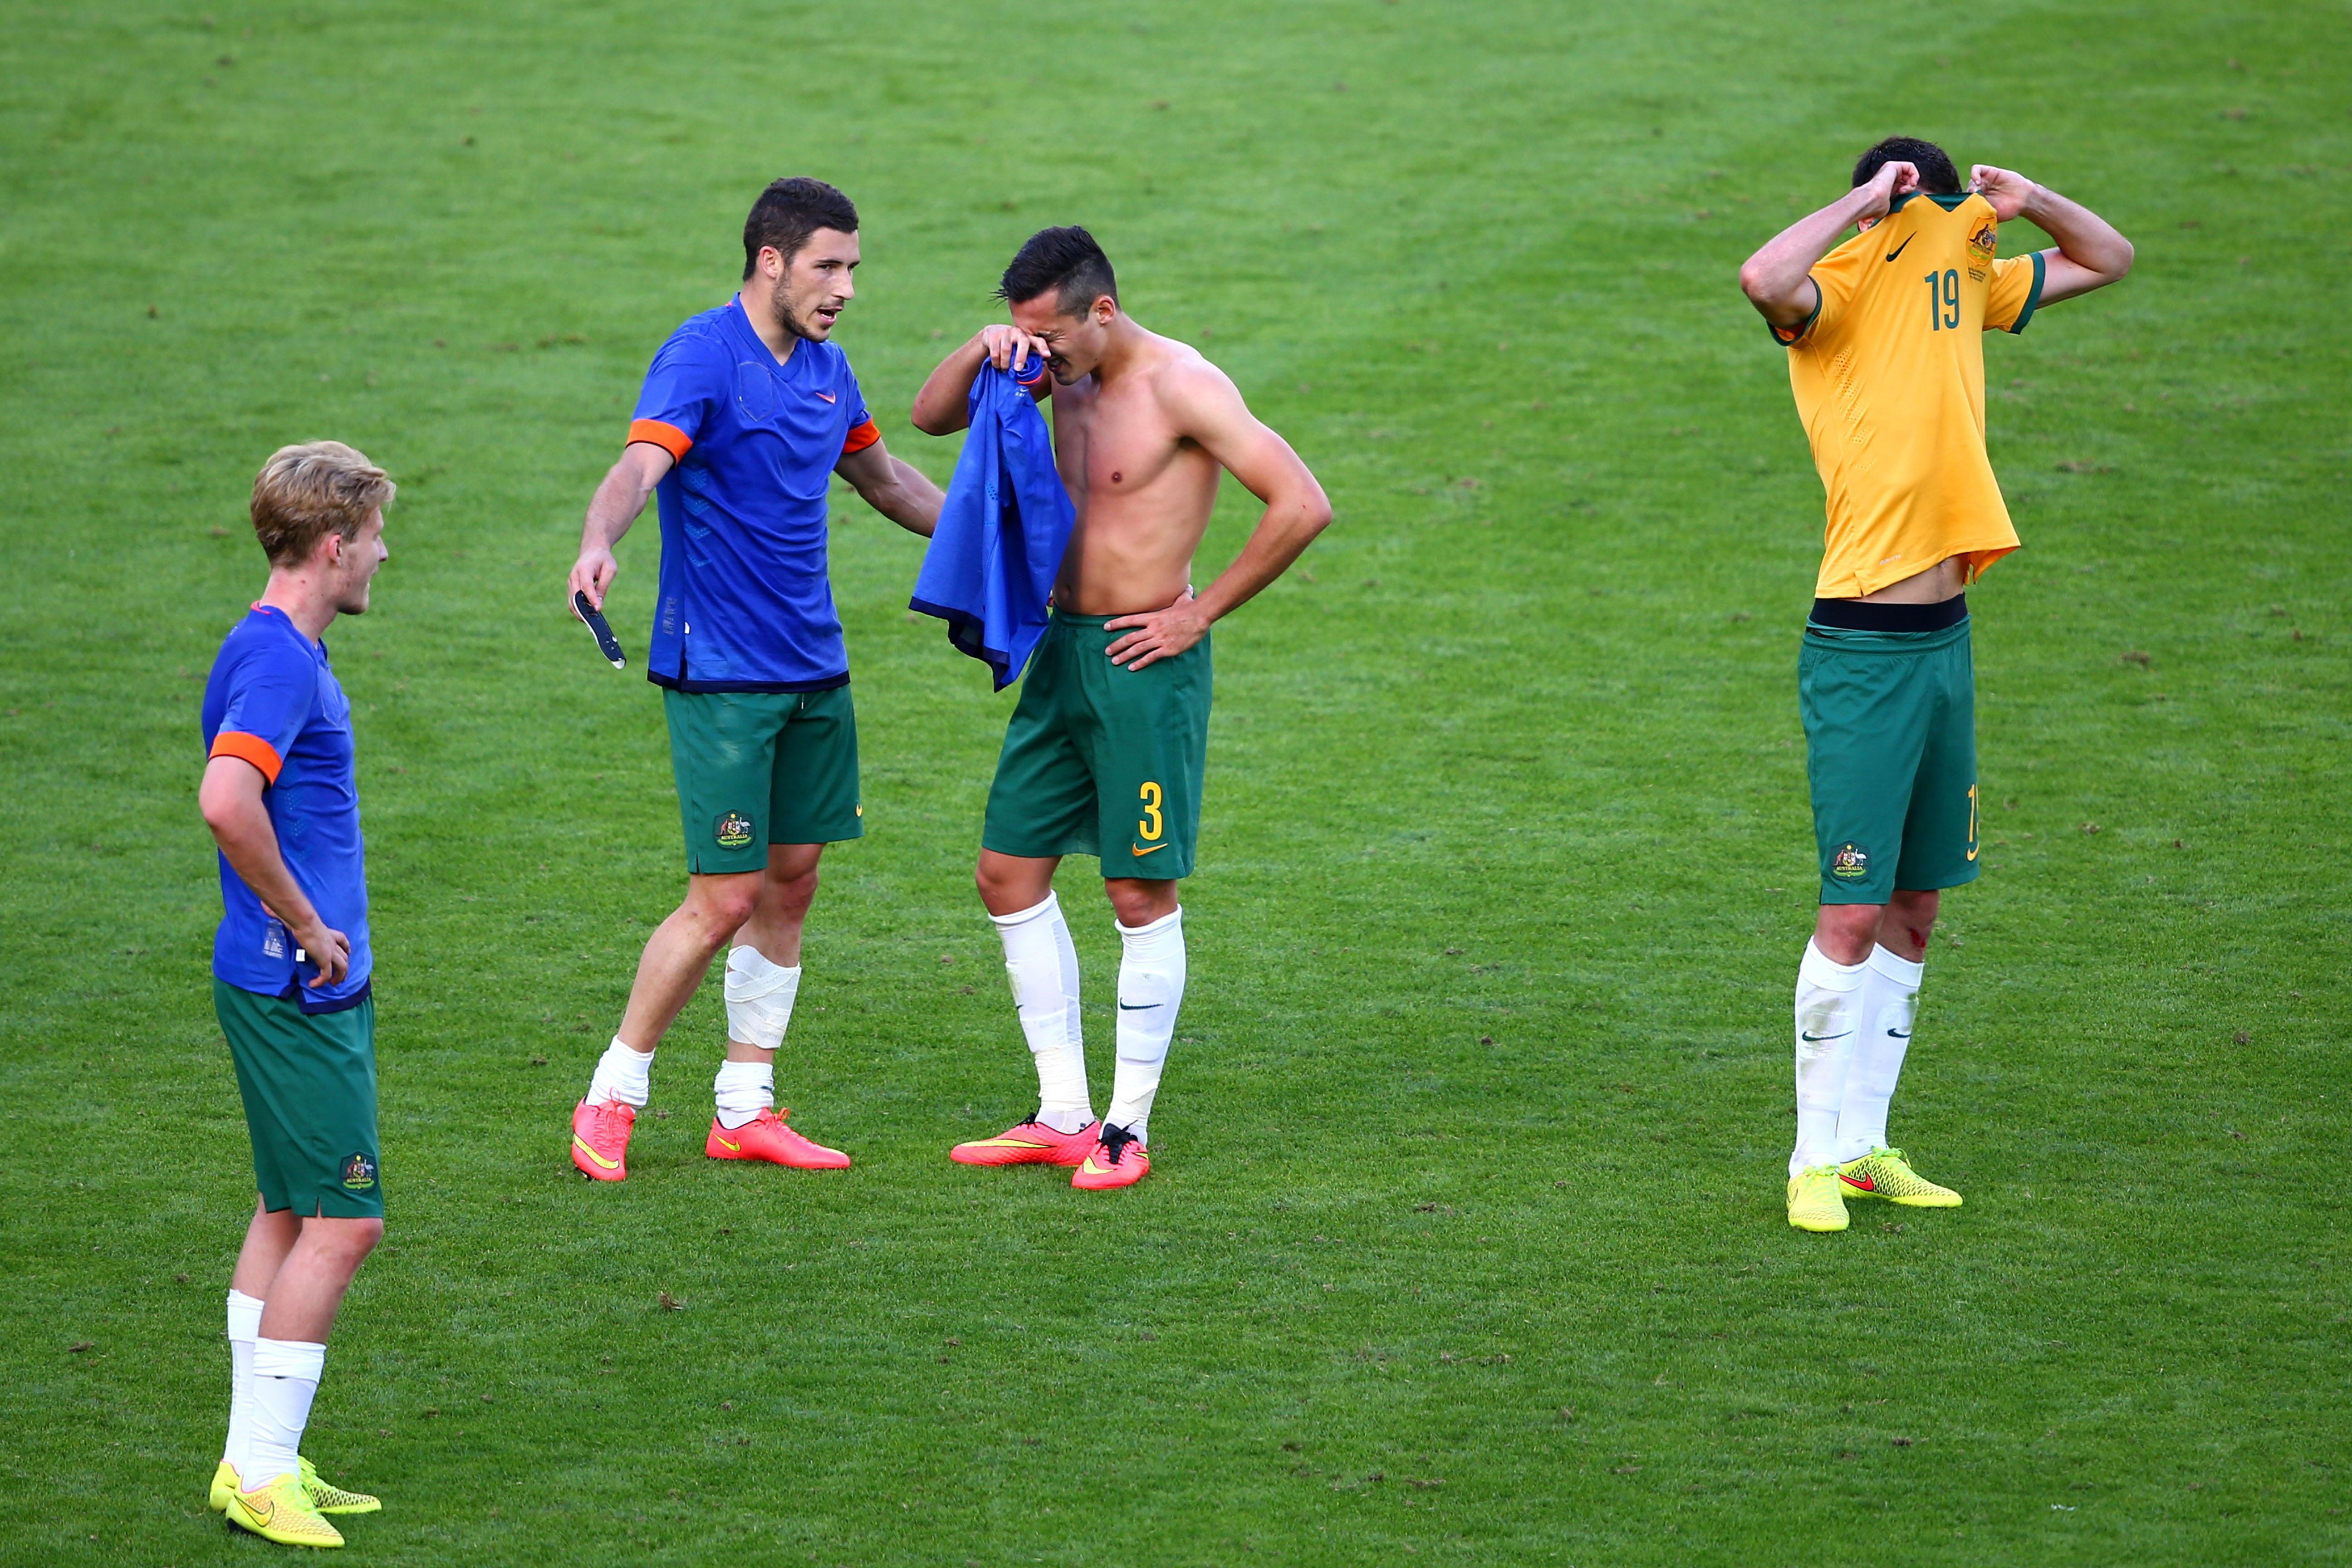 Australia players, World Cup 2014